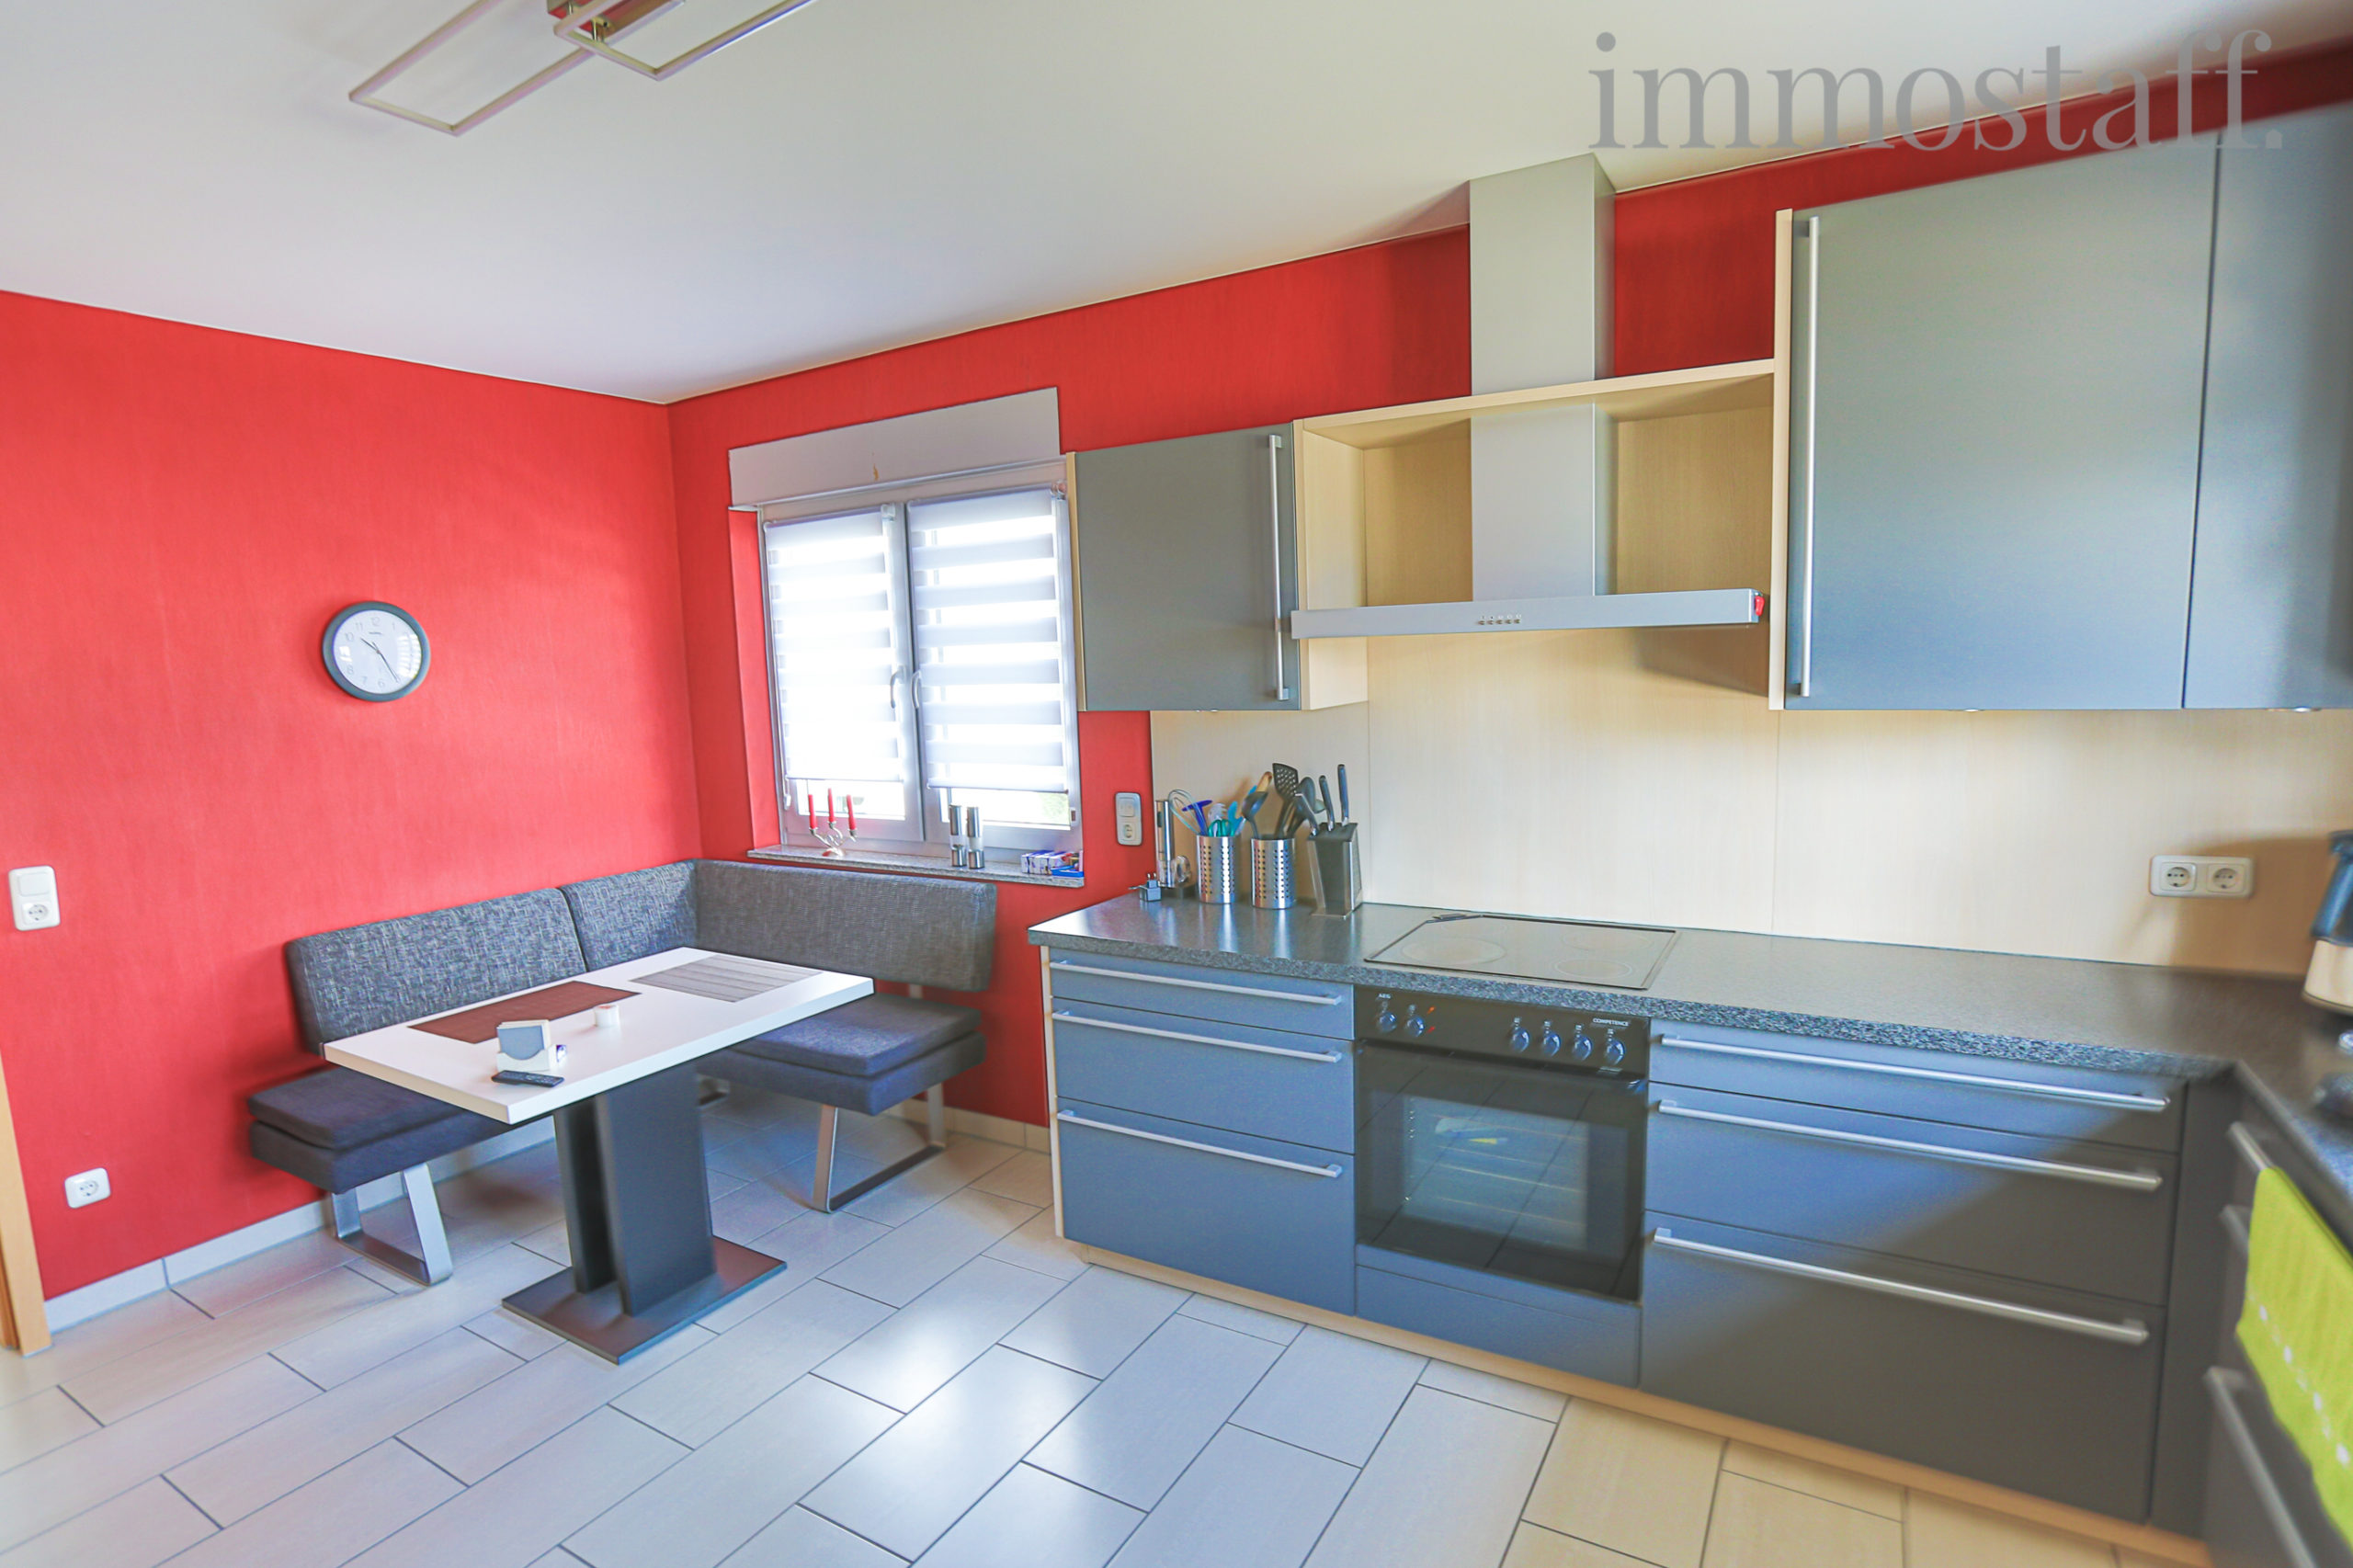 Küche im OG Ansicht 3